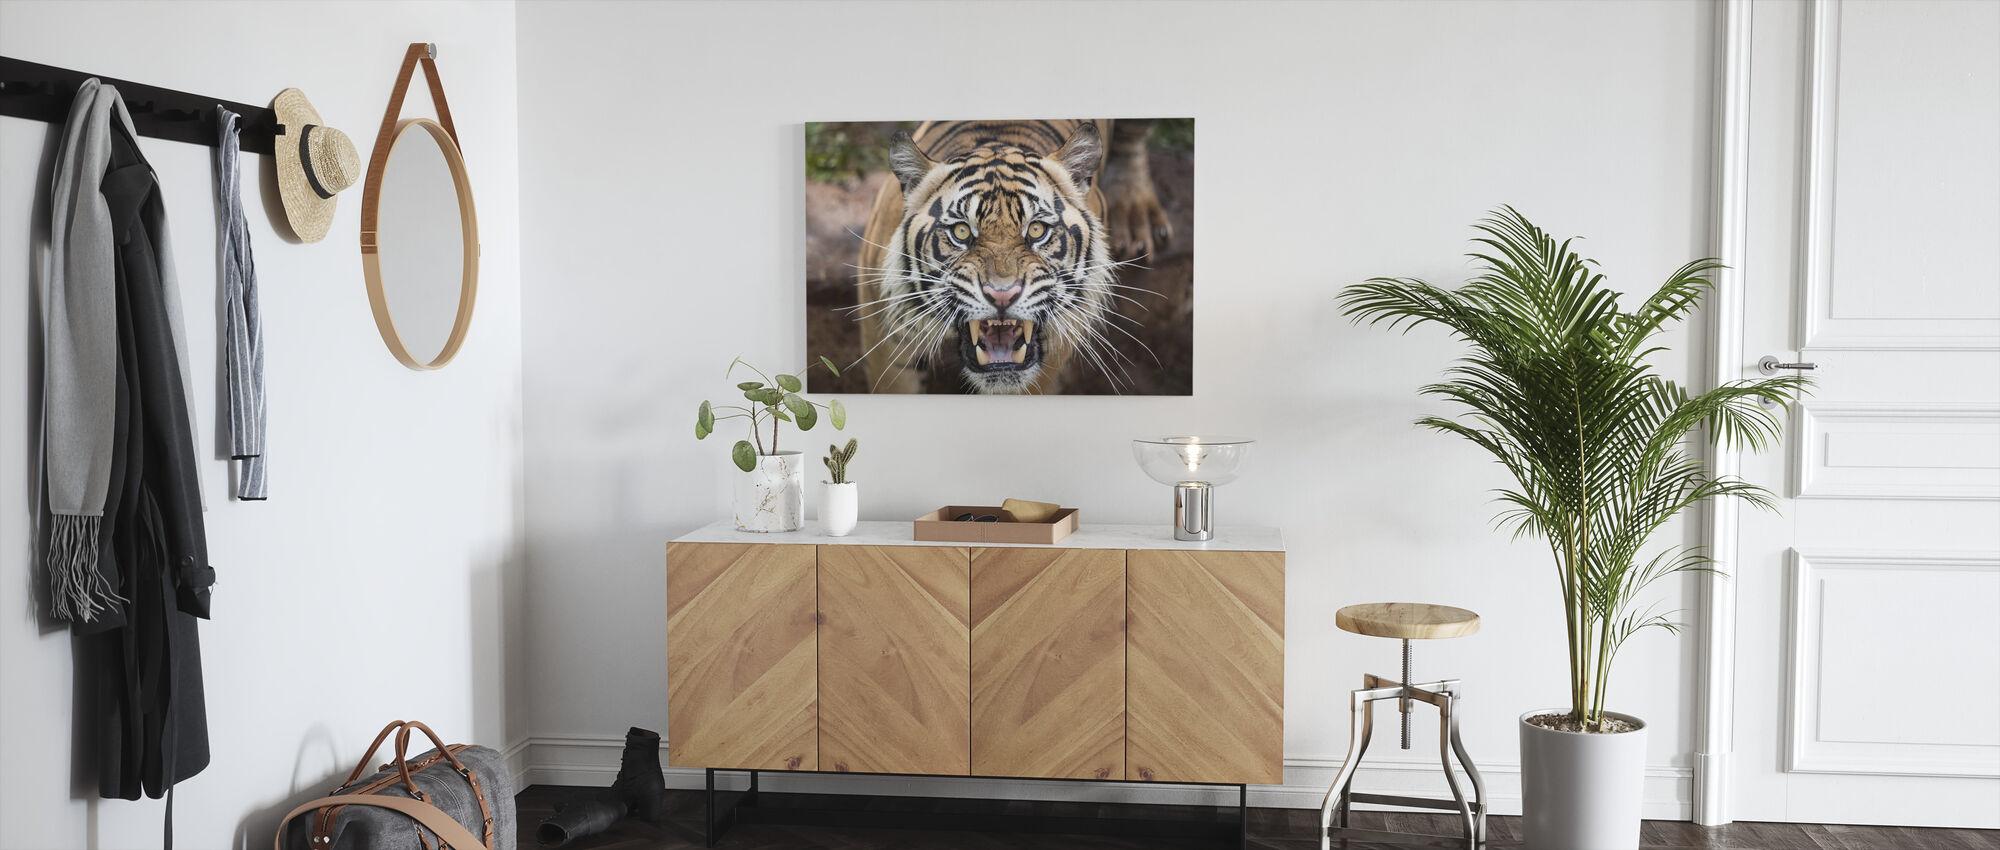 Roaring Tiger - Canvas print - Hallway